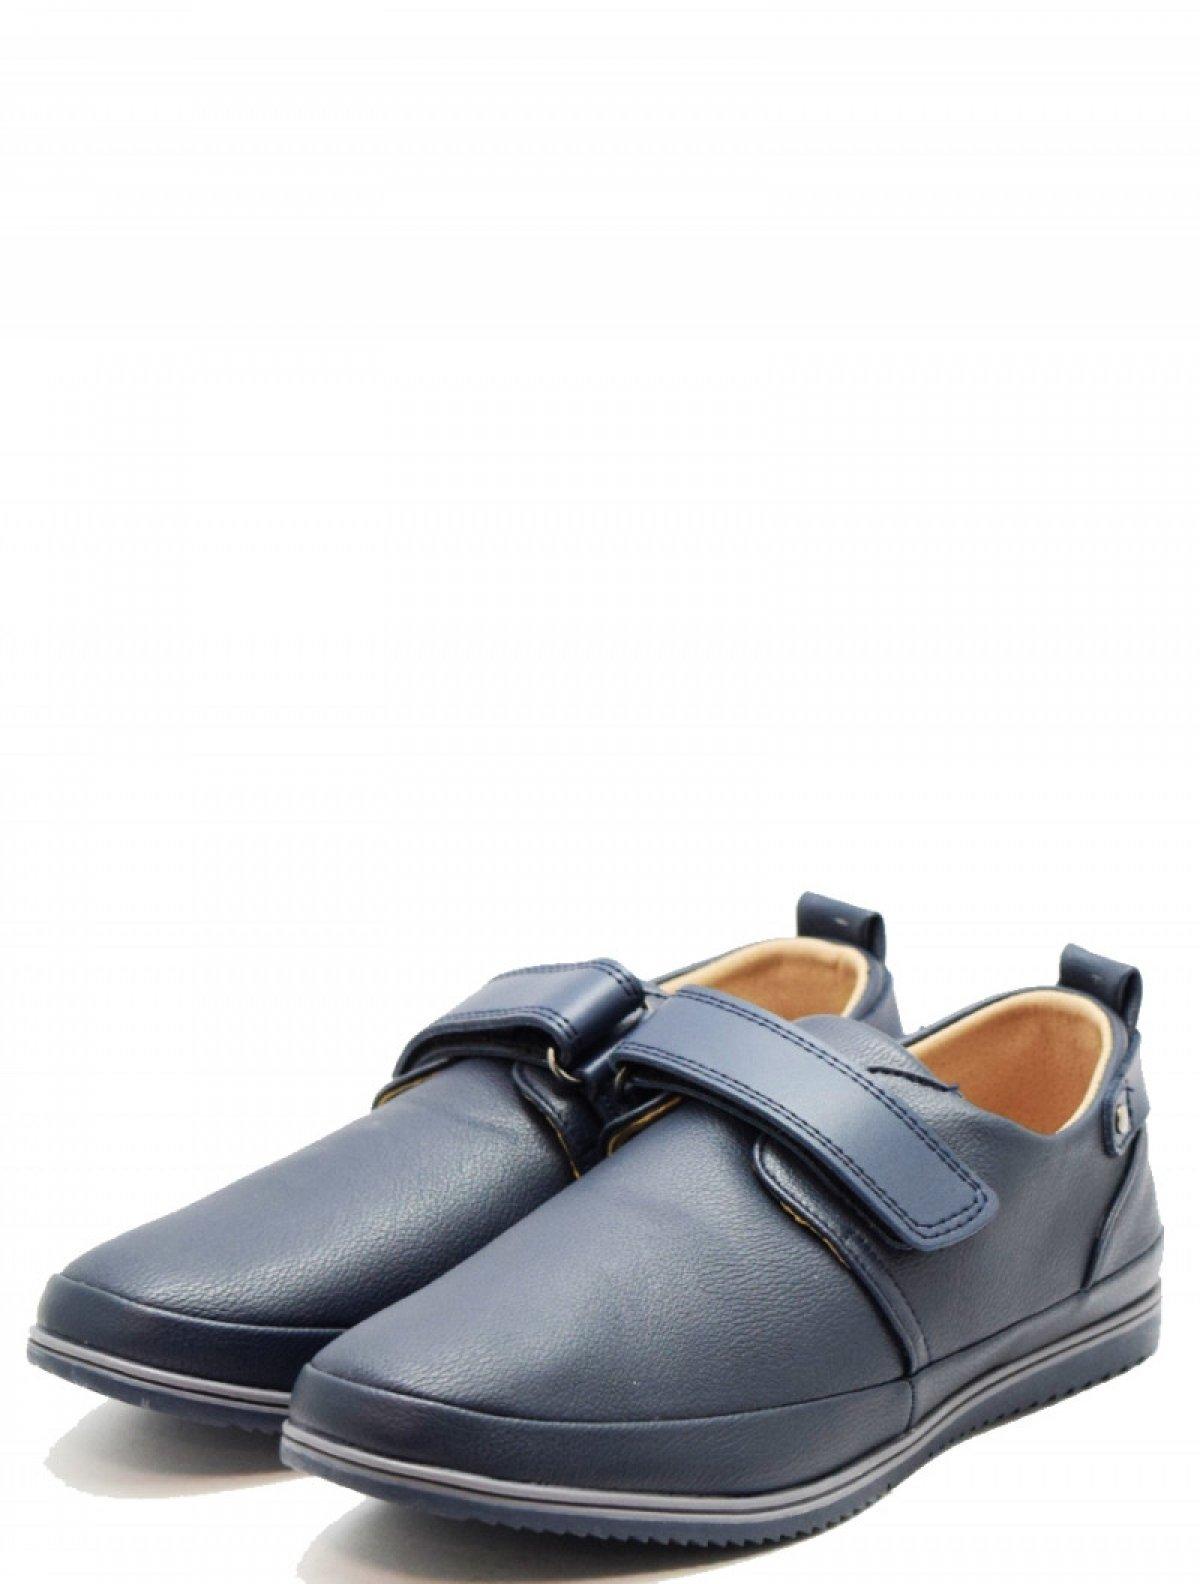 Tom Miki B-1373-B детские туфли